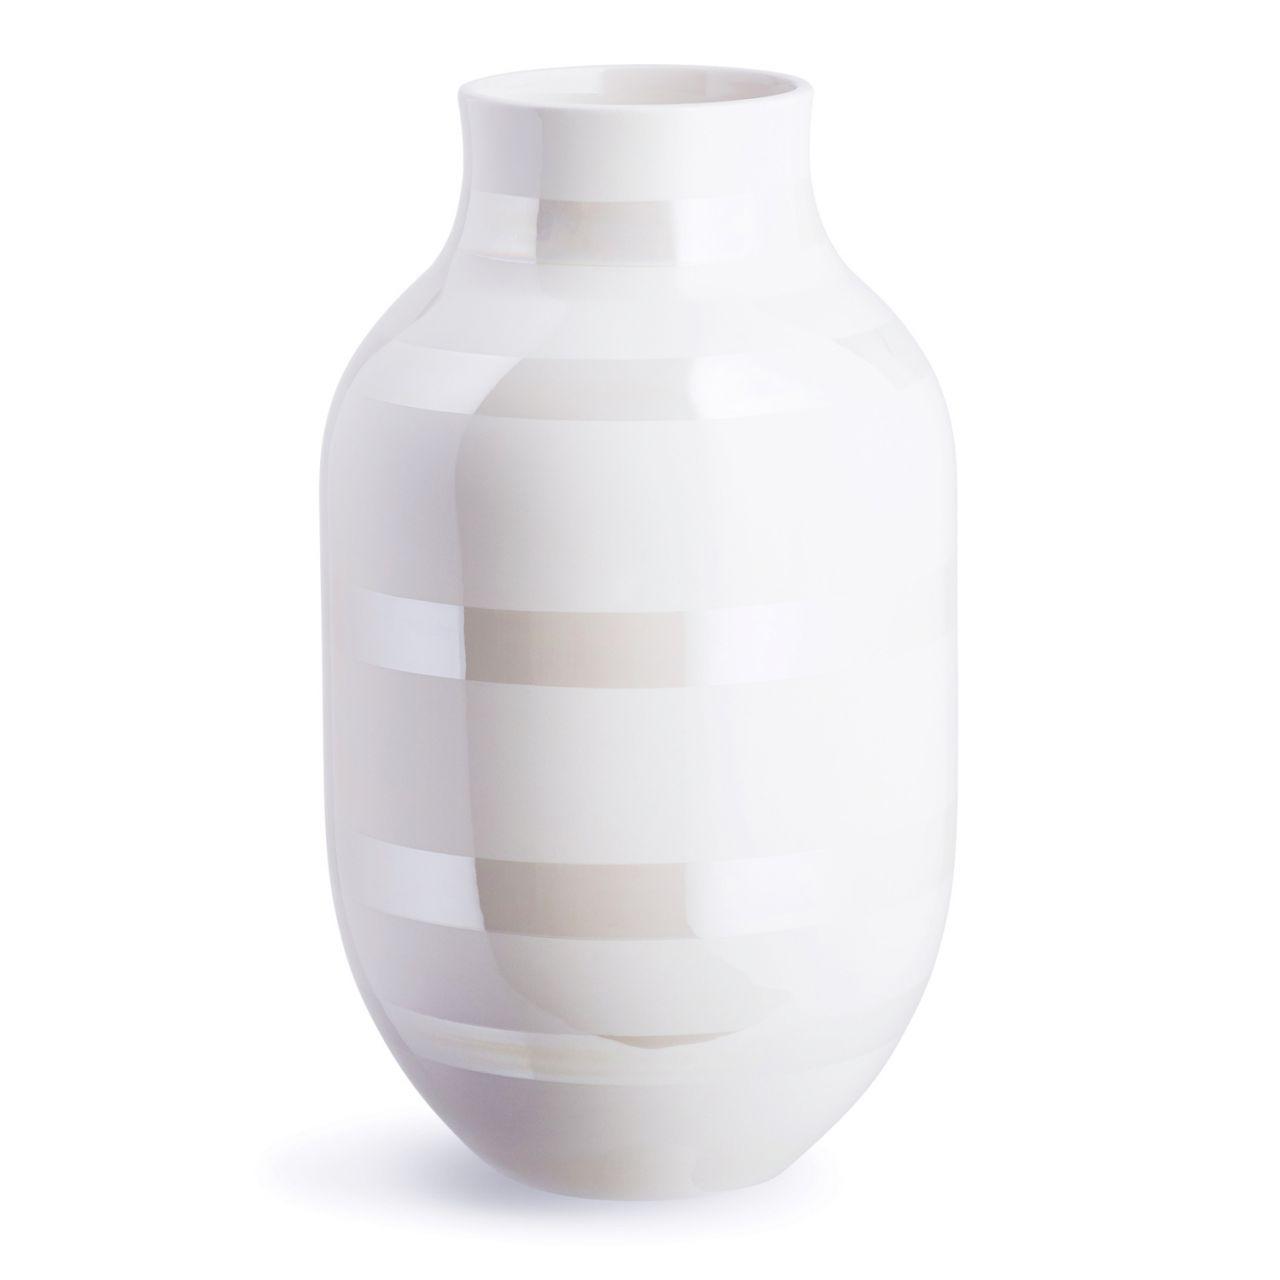 KÄHLER DESIGN Kähler - Omaggio Vase groß 16050